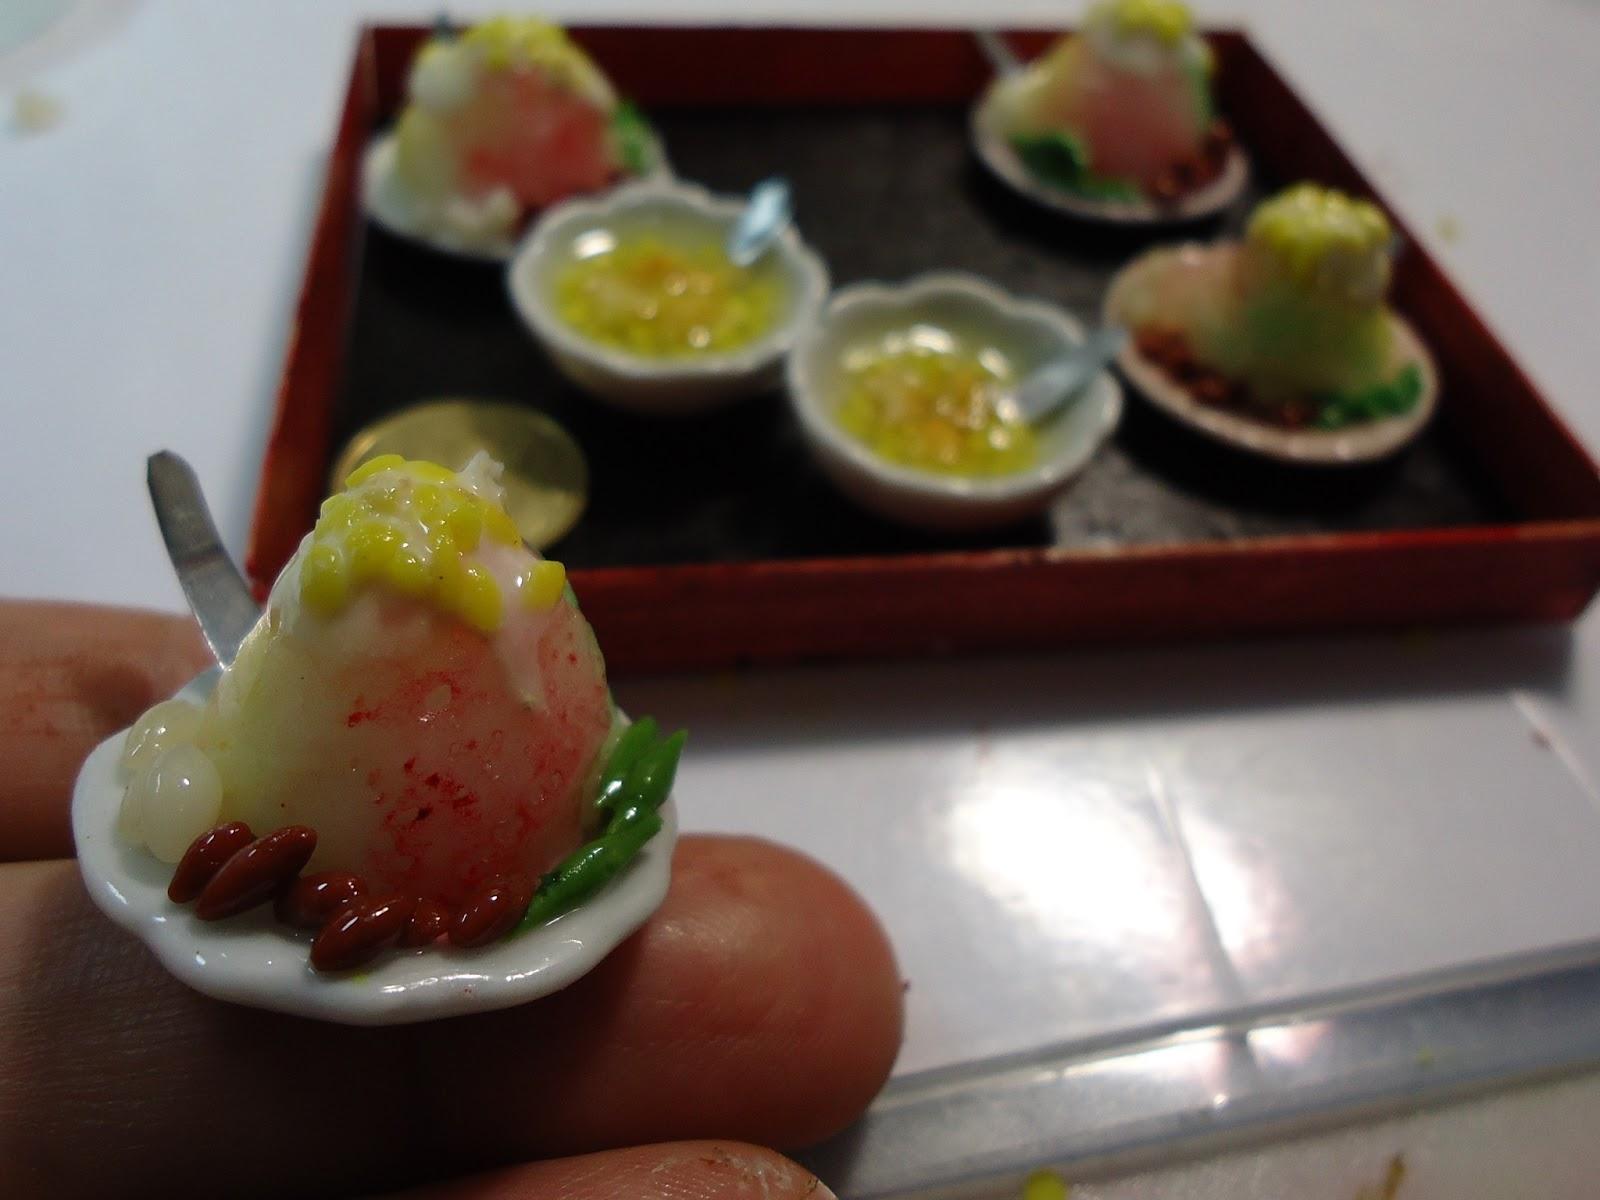 Kin 39 Miniature Workshop Handmade Clay Food By Kin Quek